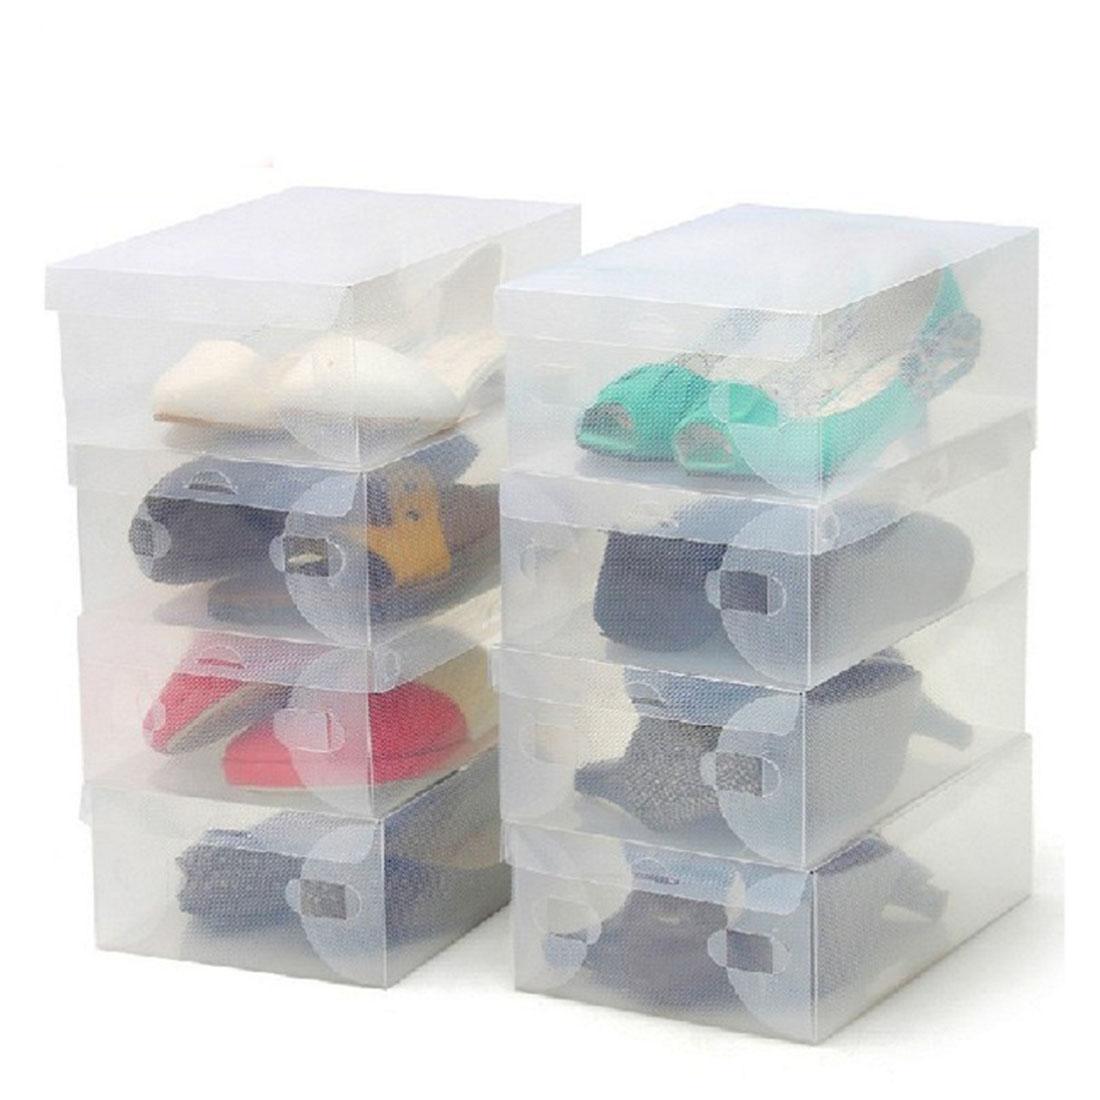 Hot New Style 10Pcs Transparent Clear Plastic Shoes Storage Boxes Foldable Shoes Toys Case Holder - intl